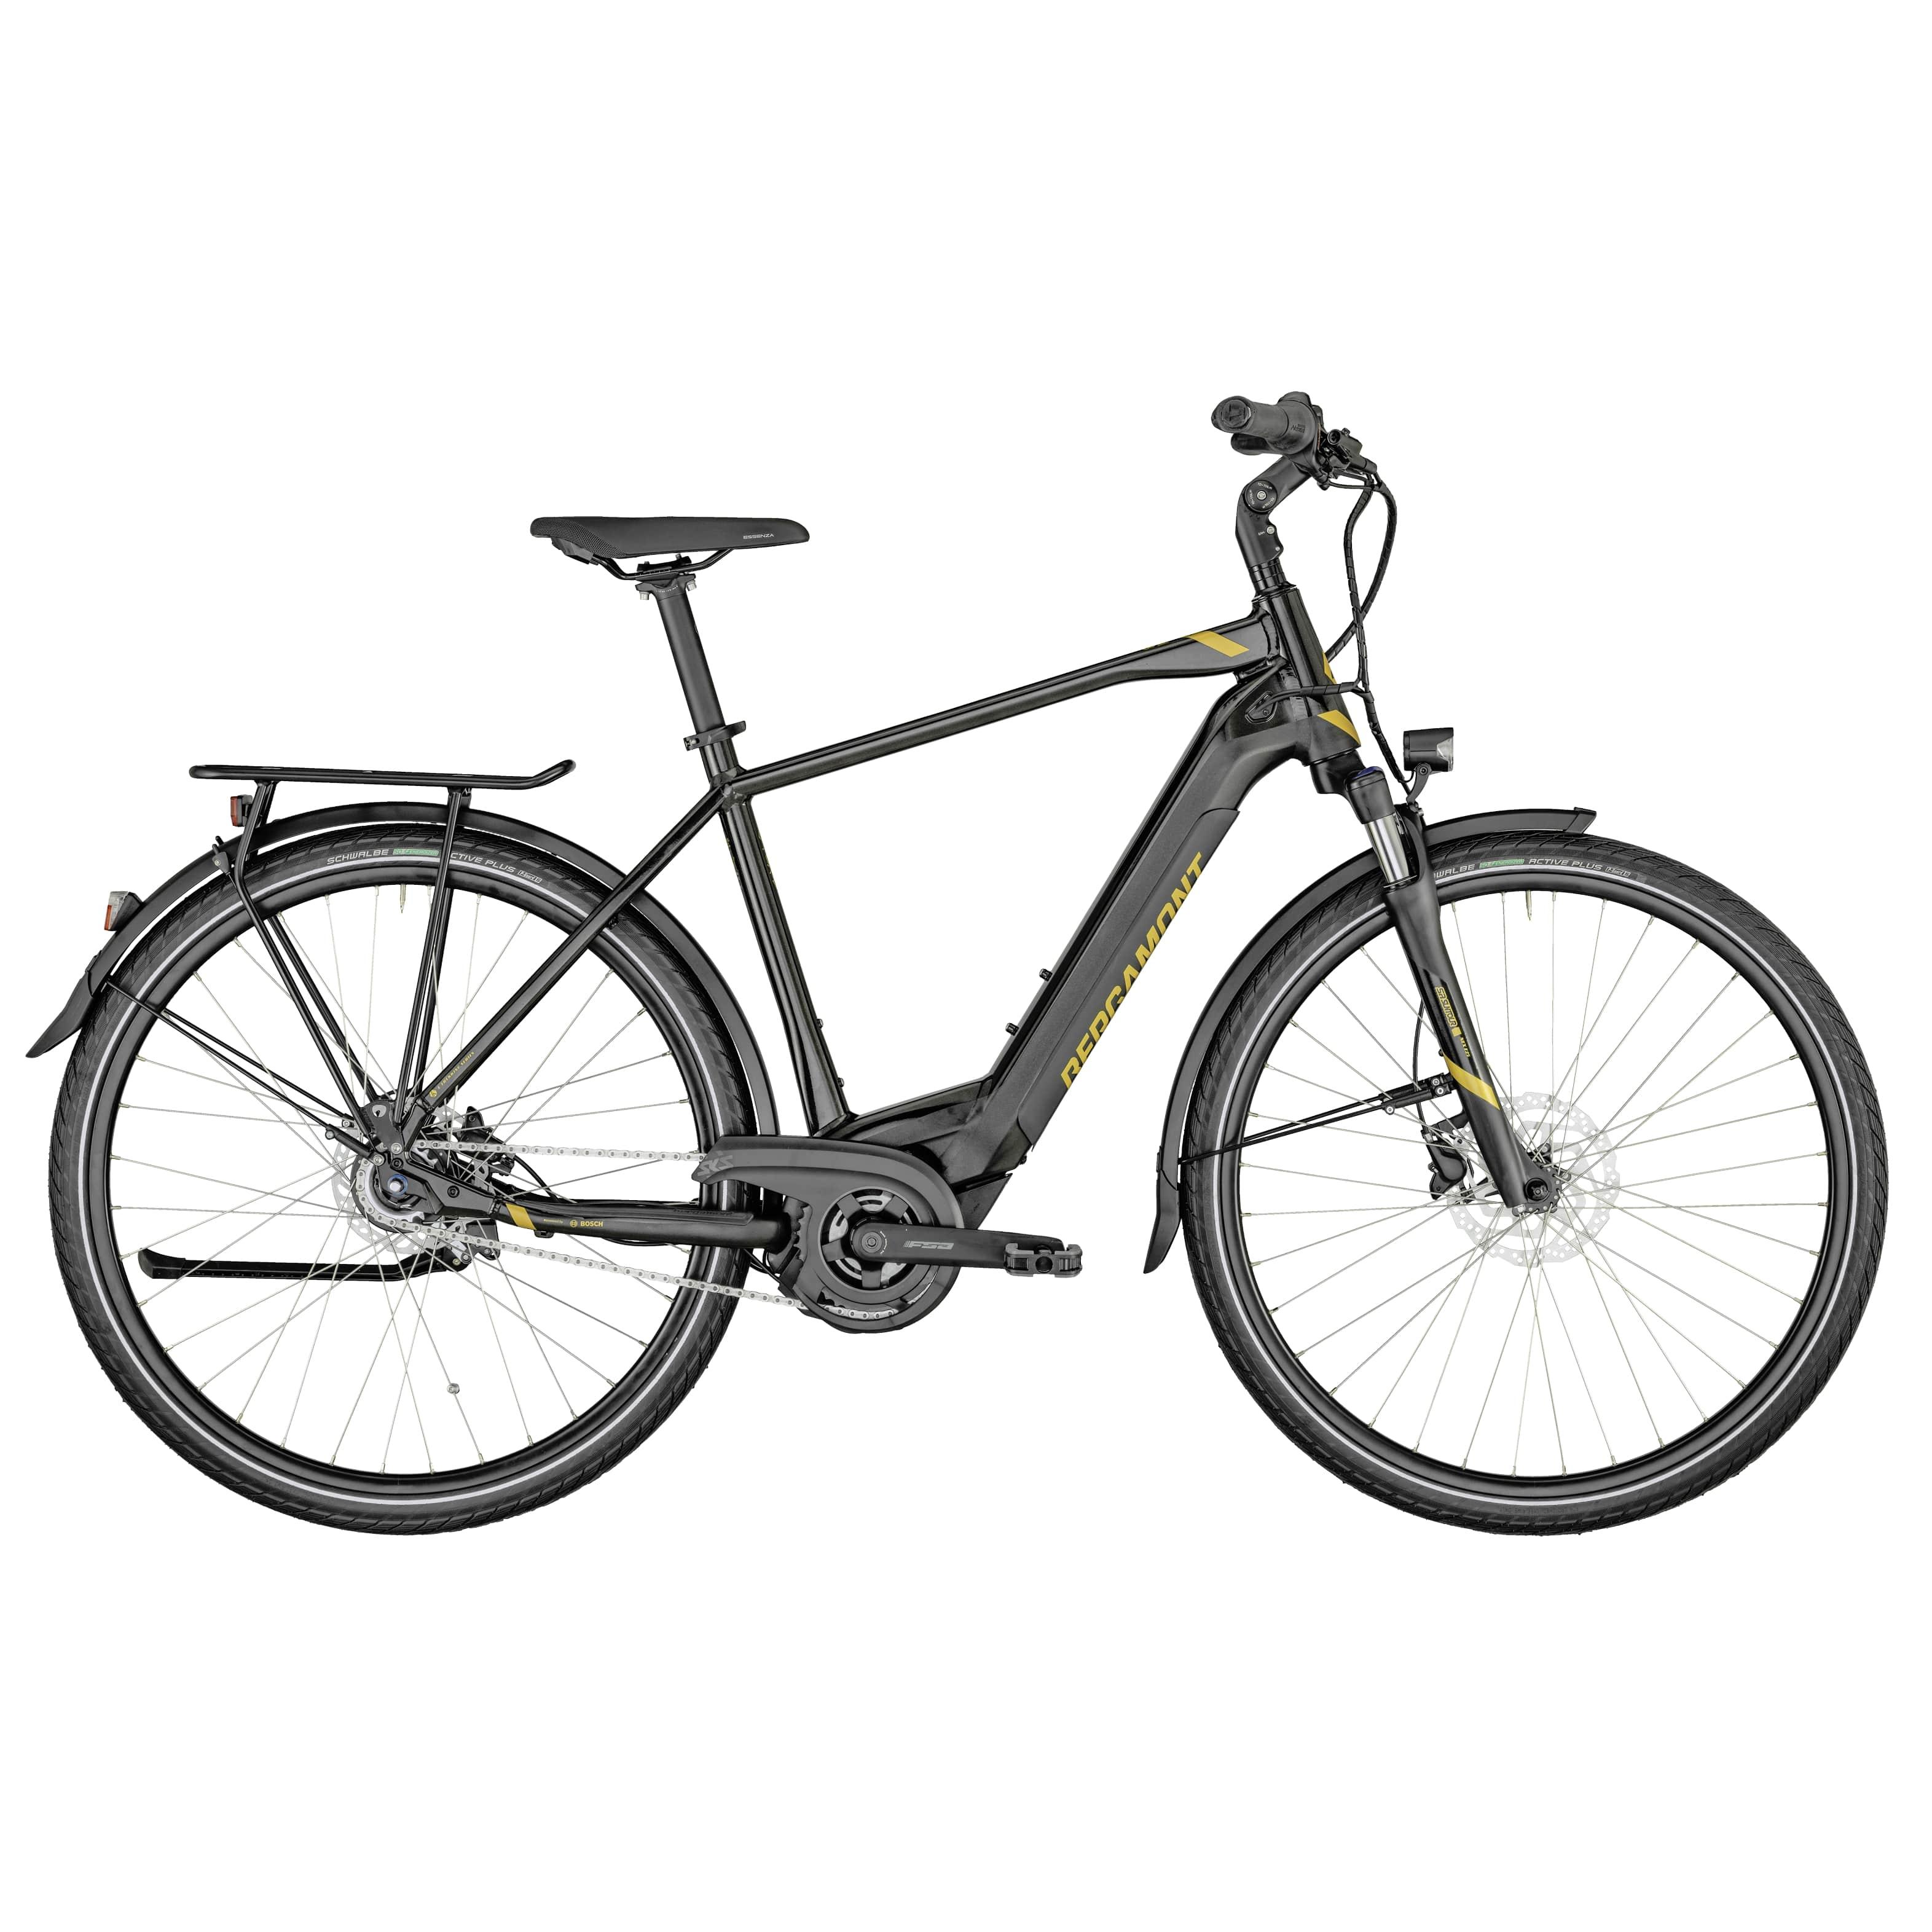 "BGM Bike E-Horizon N8 CB 500 Gent, Diamant, M52 - 500WH, Rücktritt, black gold dust, 28"", MJ2021"